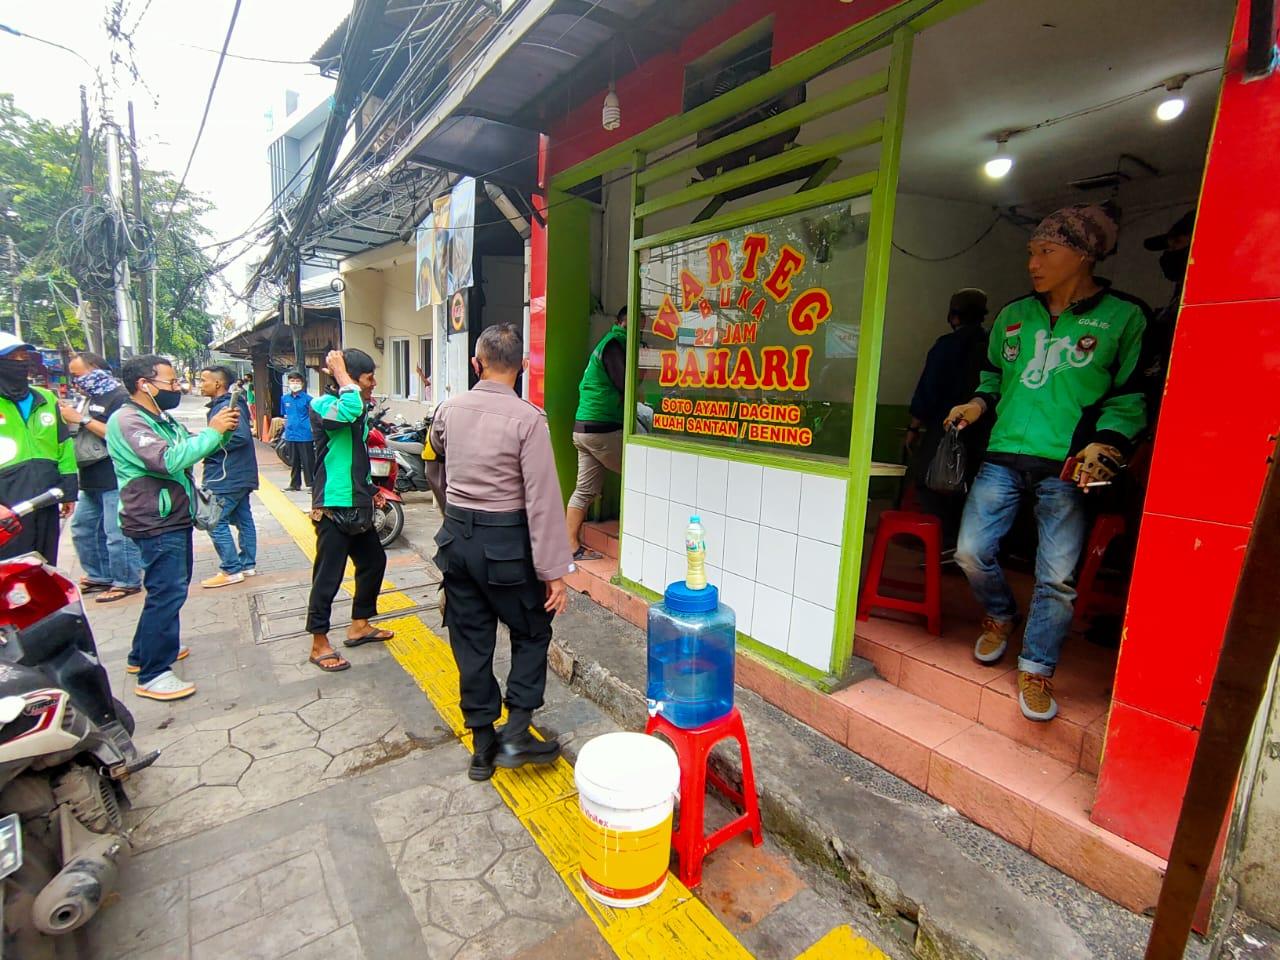 Peduli Nasib Driver Ojol, Polres Jakarta Barat Adakan Program Penyediaan Makanan Gratis Untuk Ojol